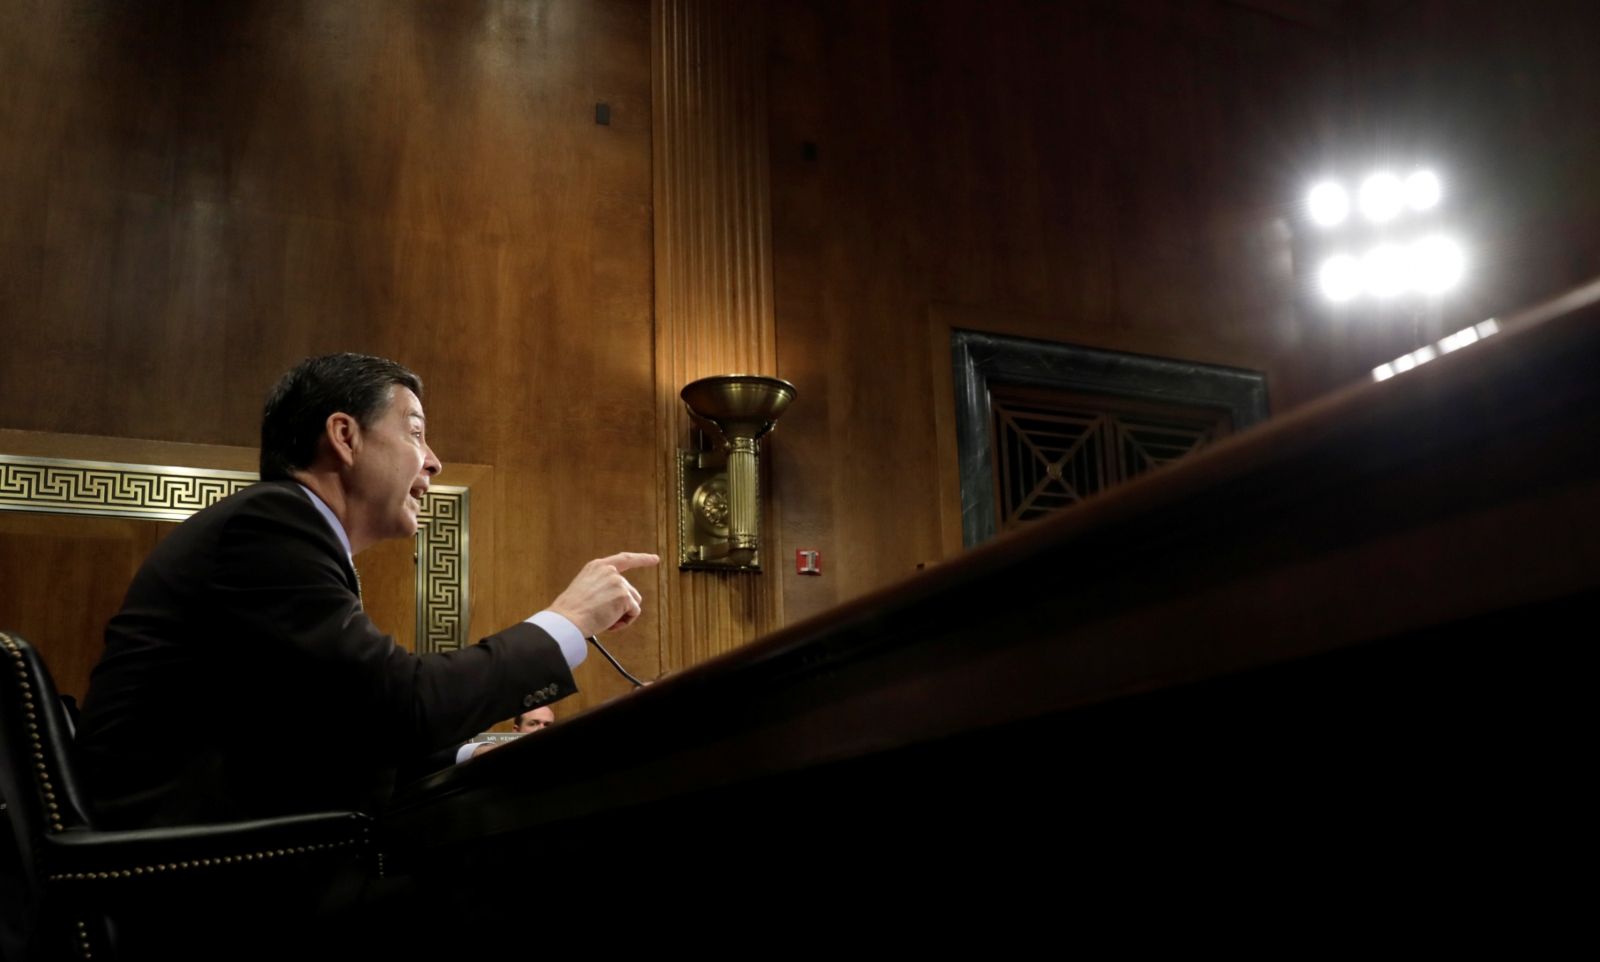 James Comey testifies at Senate Judiciary Committee